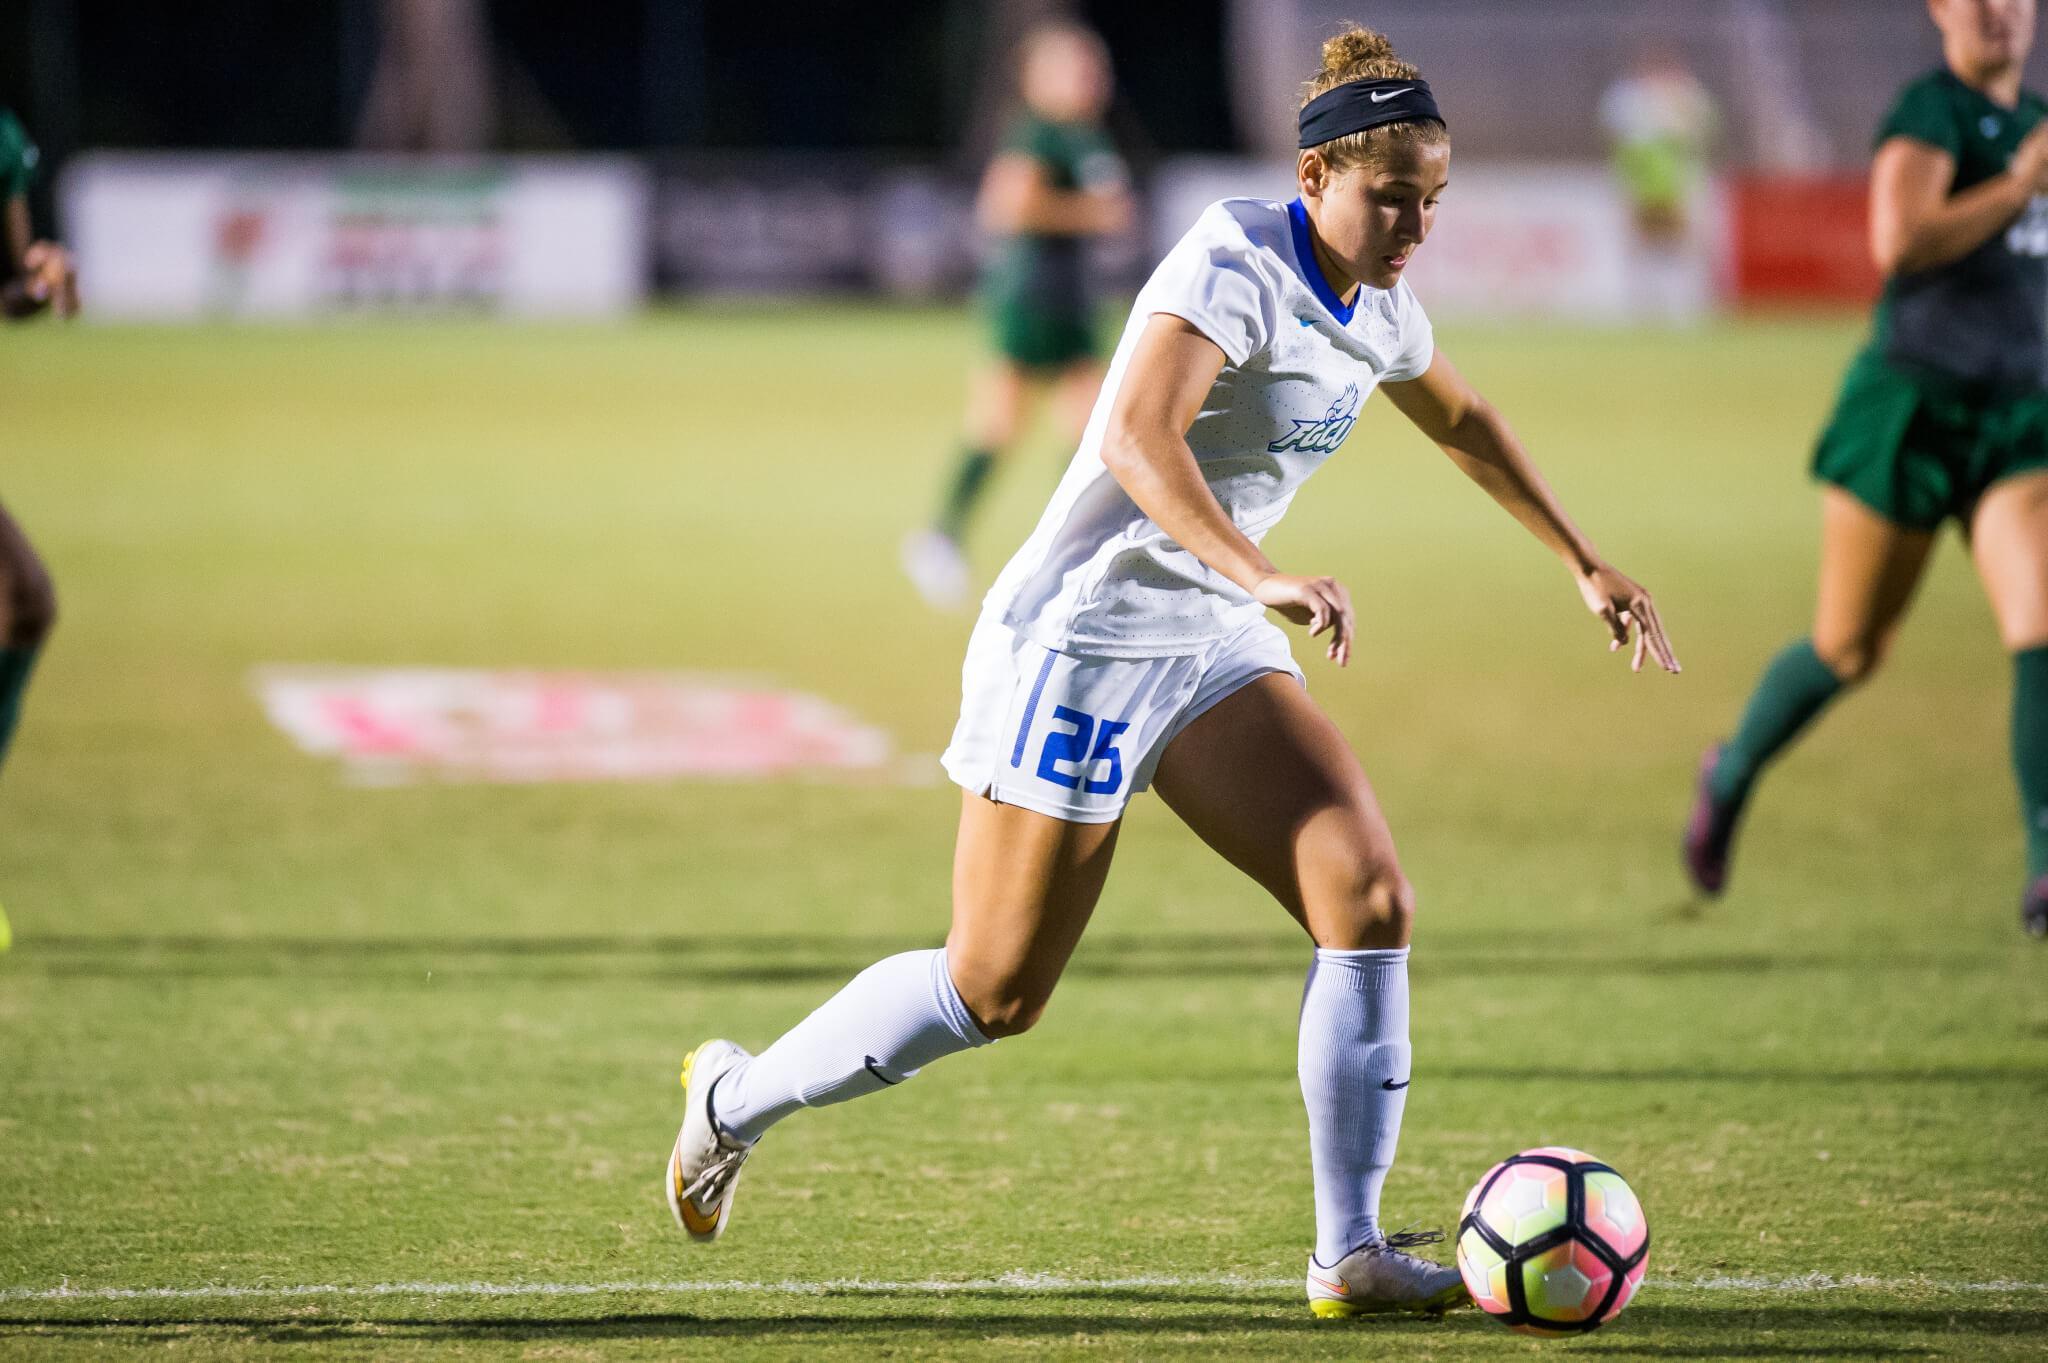 FGCU women's soccer defeats Jacksonville 2-0 on senior night